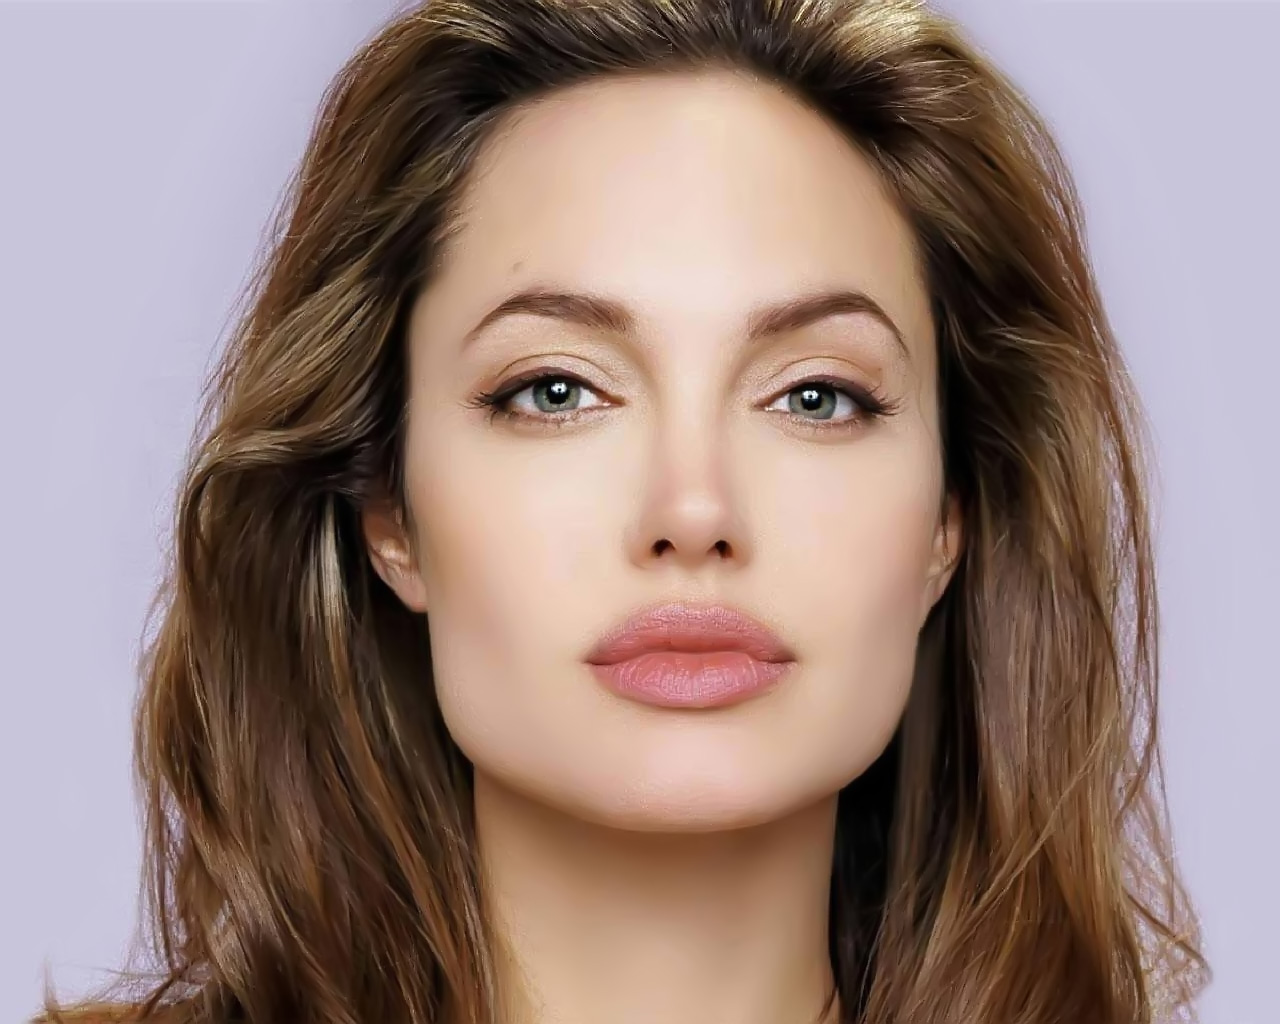 http://3.bp.blogspot.com/-e5RZBTe8dqc/UUkL9ZB3rBI/AAAAAAAAE9w/b5ldc8y3-OY/s1600/Wikimise-Angelina+Jolie.jpg